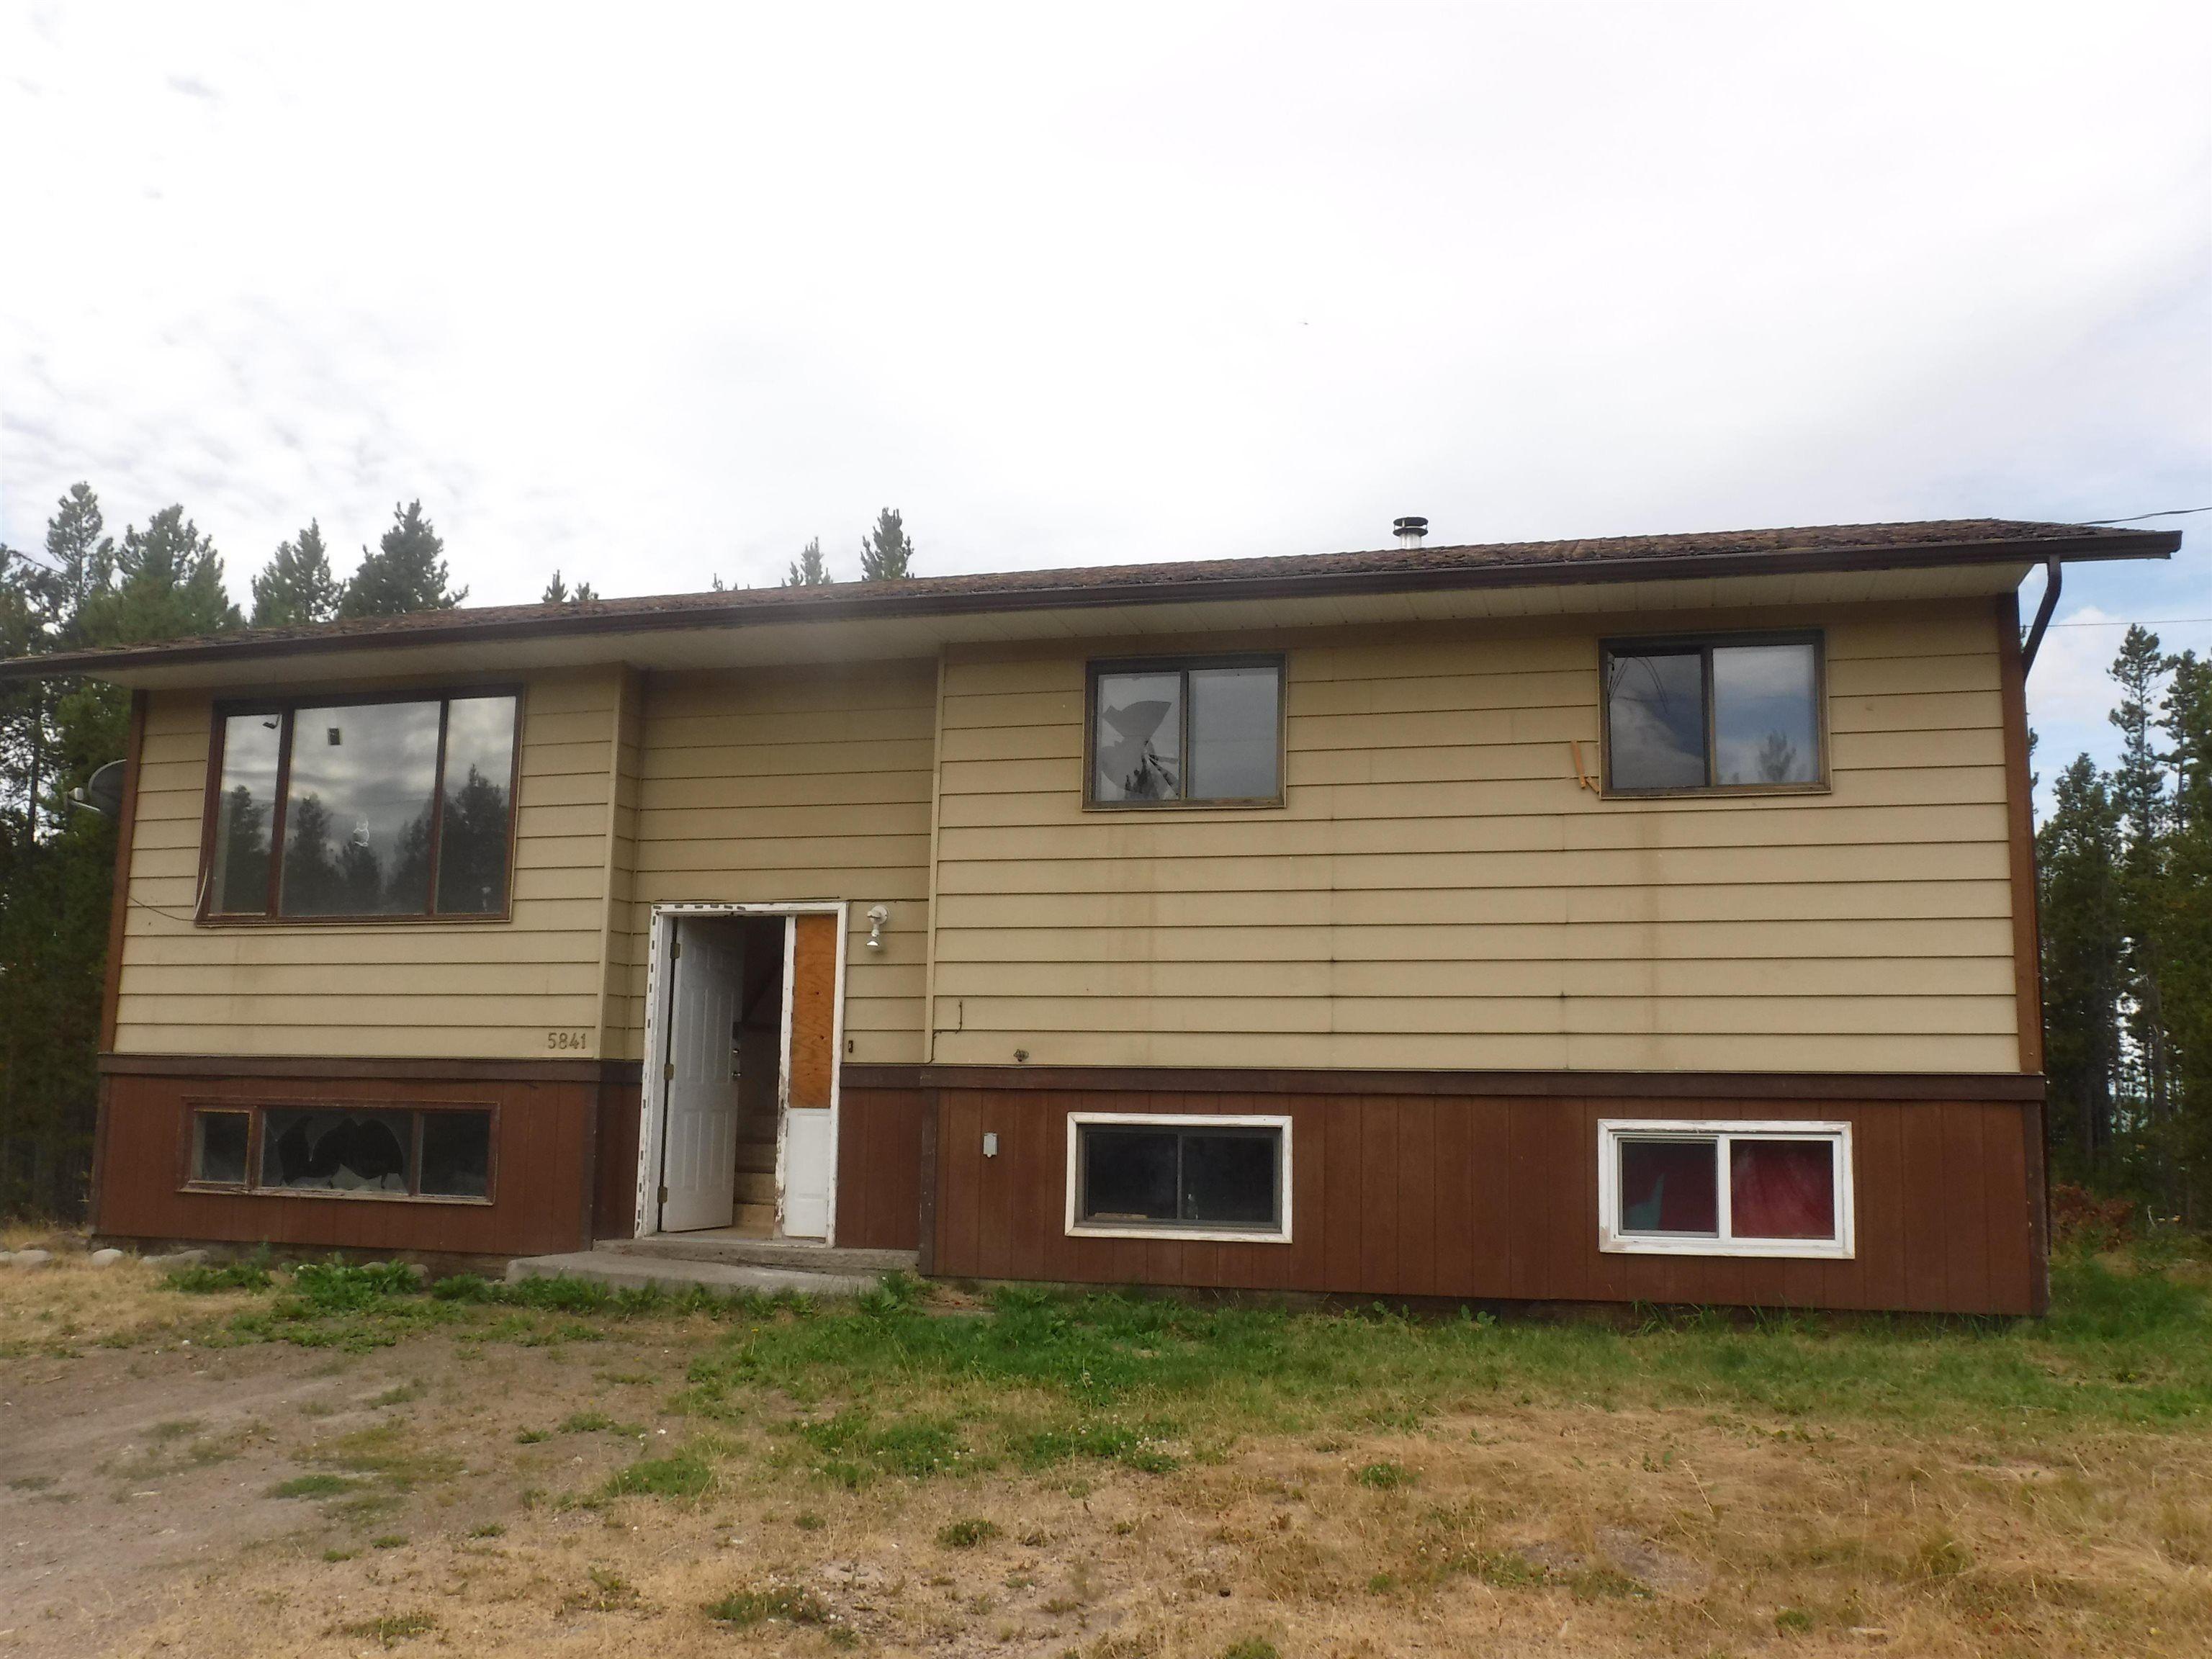 Main Photo: 5841 THOMPSON Road in Williams Lake: Williams Lake - Rural West House for sale (Williams Lake (Zone 27))  : MLS®# R2616984